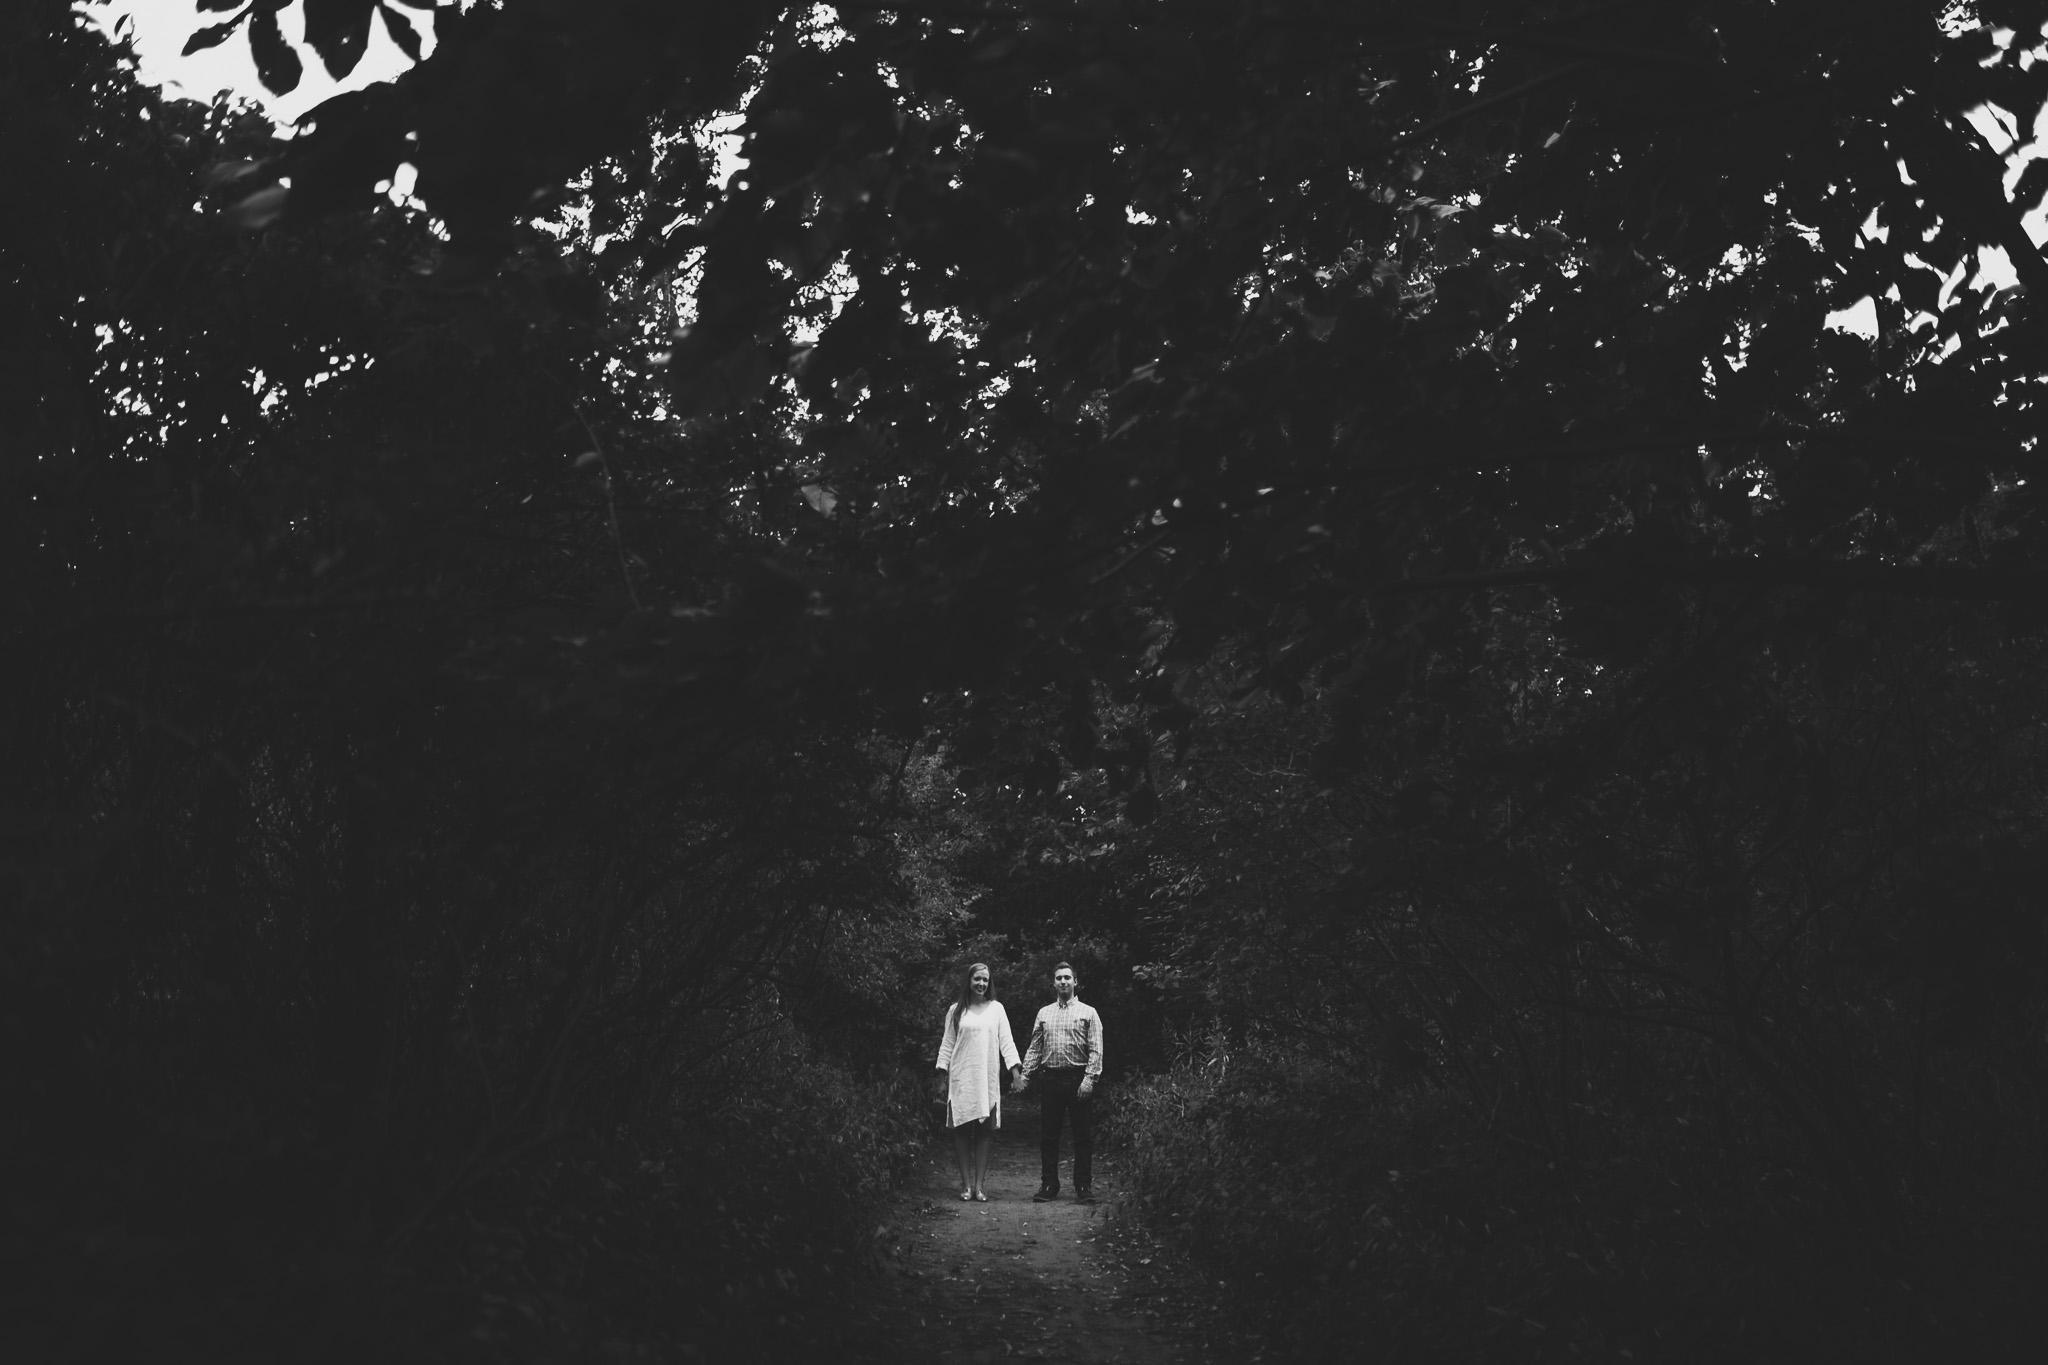 012-Jonathan-Kuhn-Photography-Marc-Kelsey-Engagement-WEB-8751.jpg